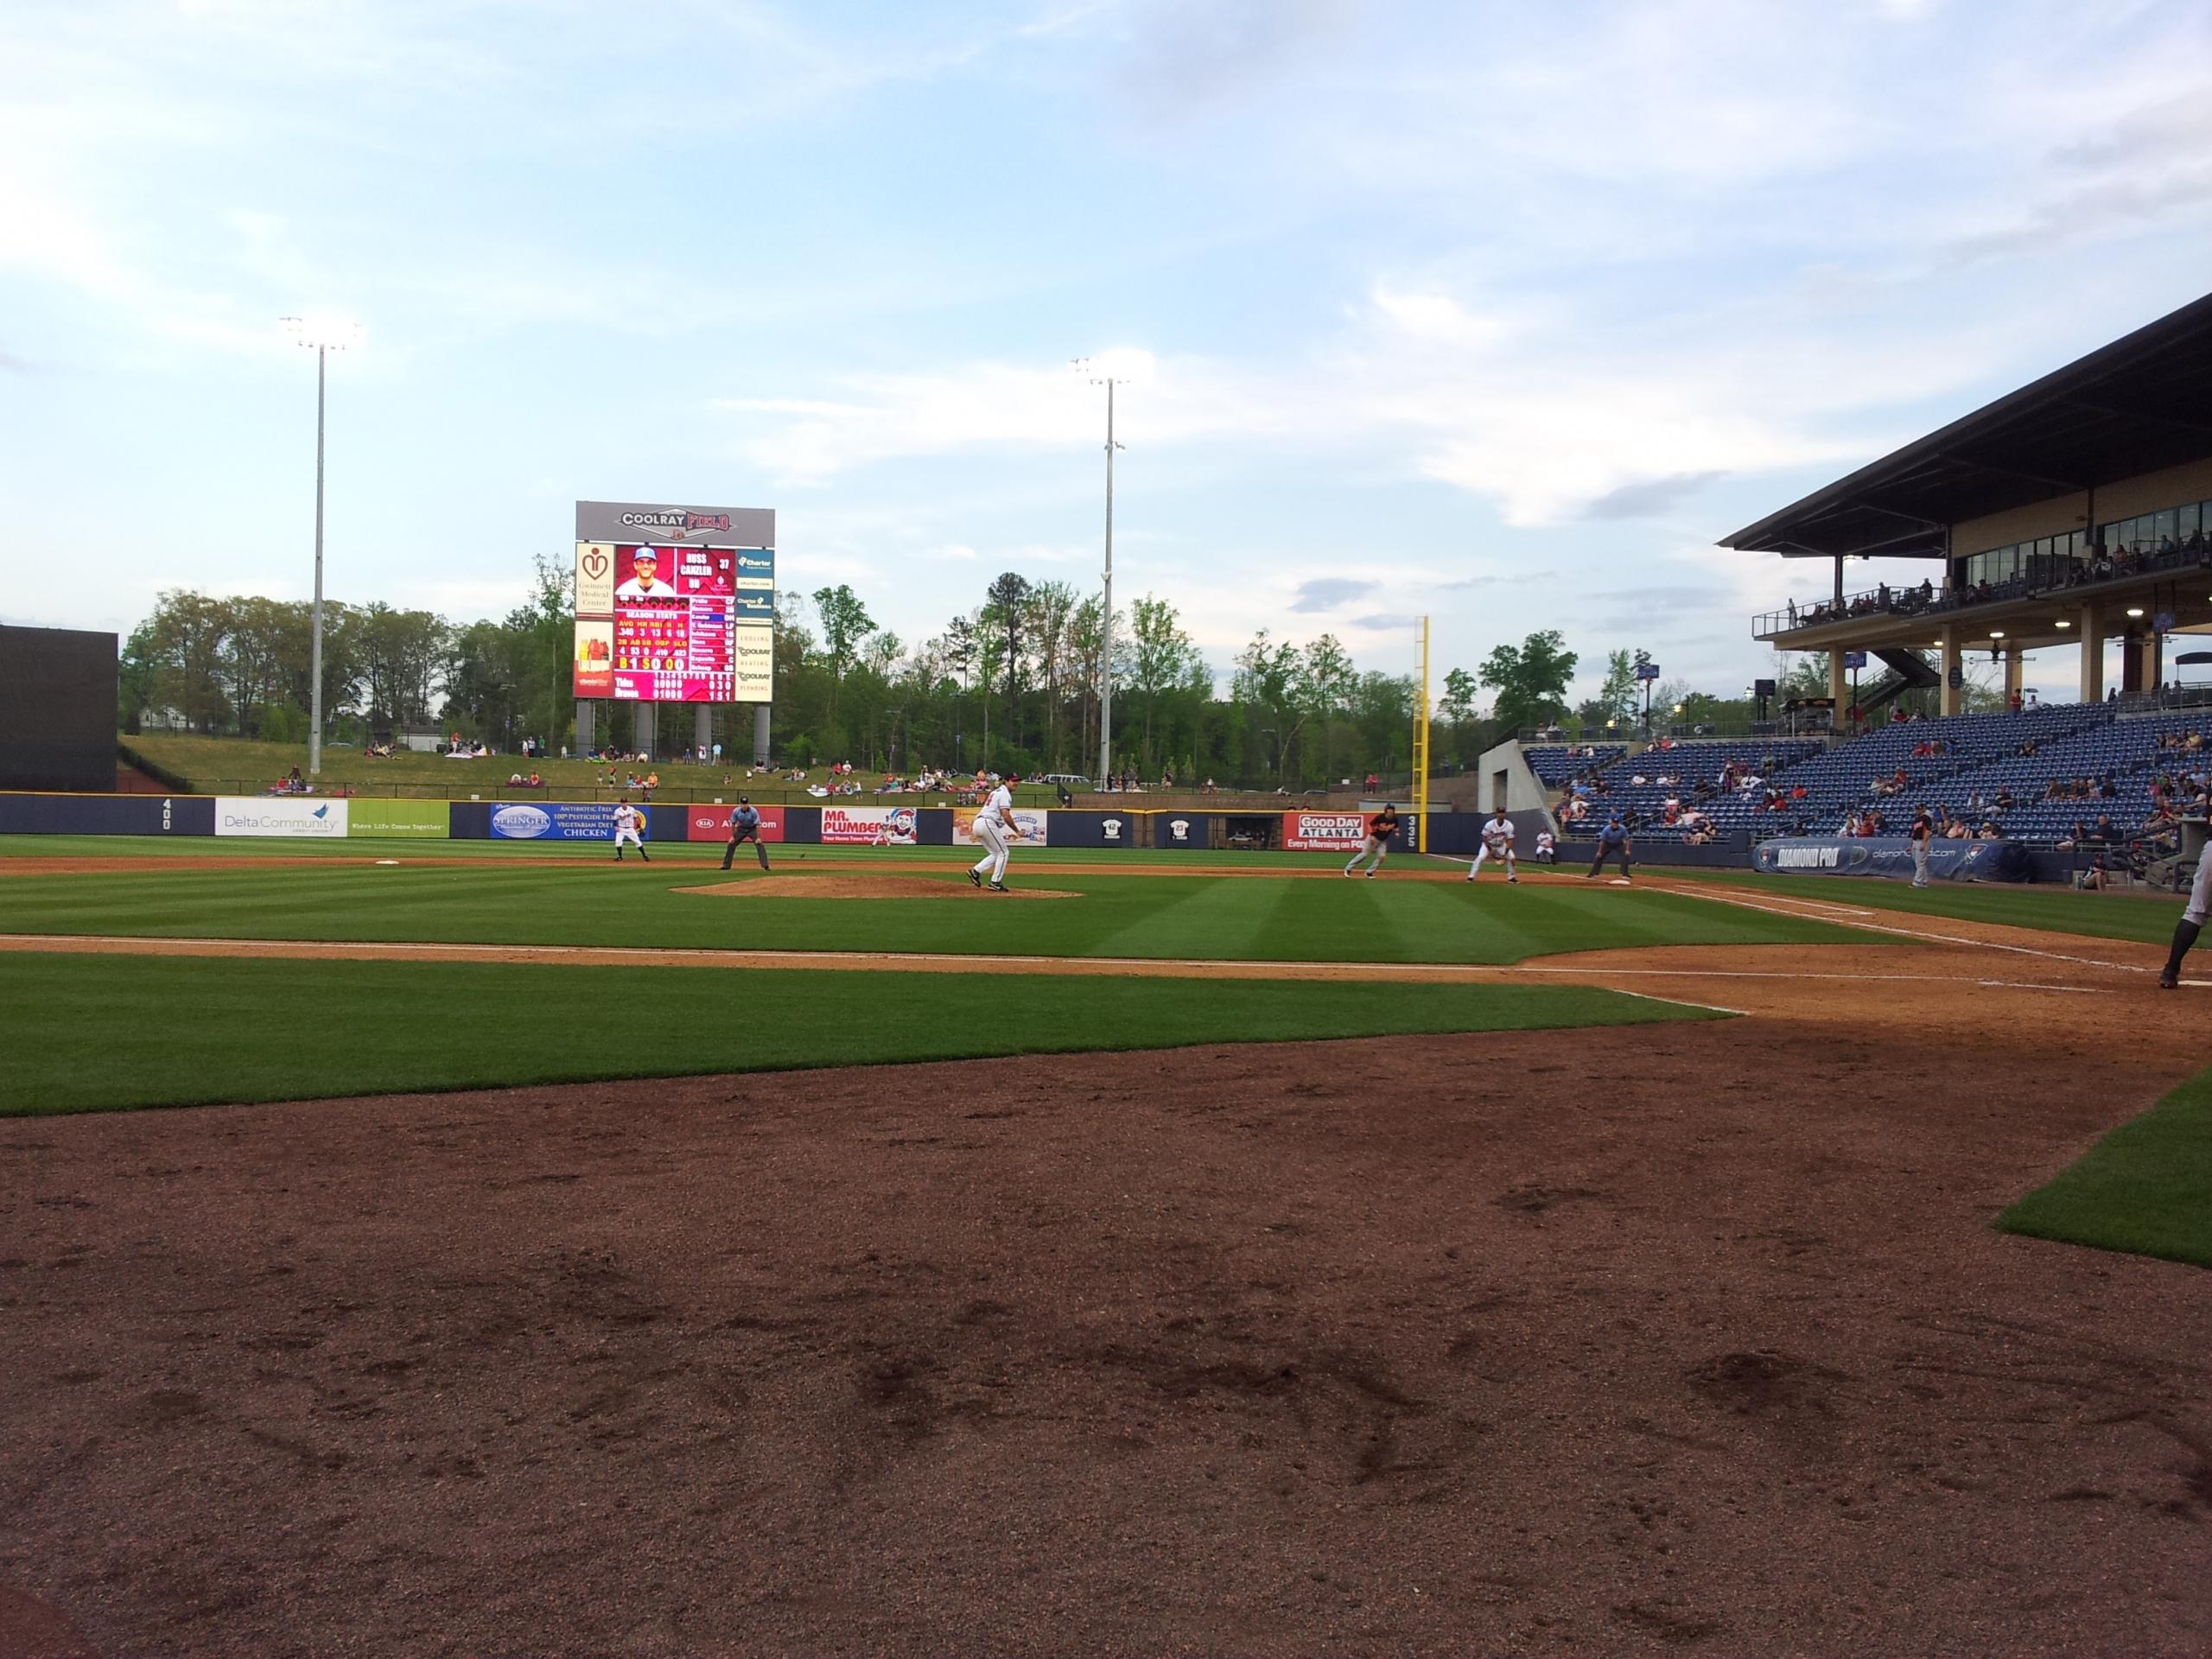 baseball-spiel-scaled